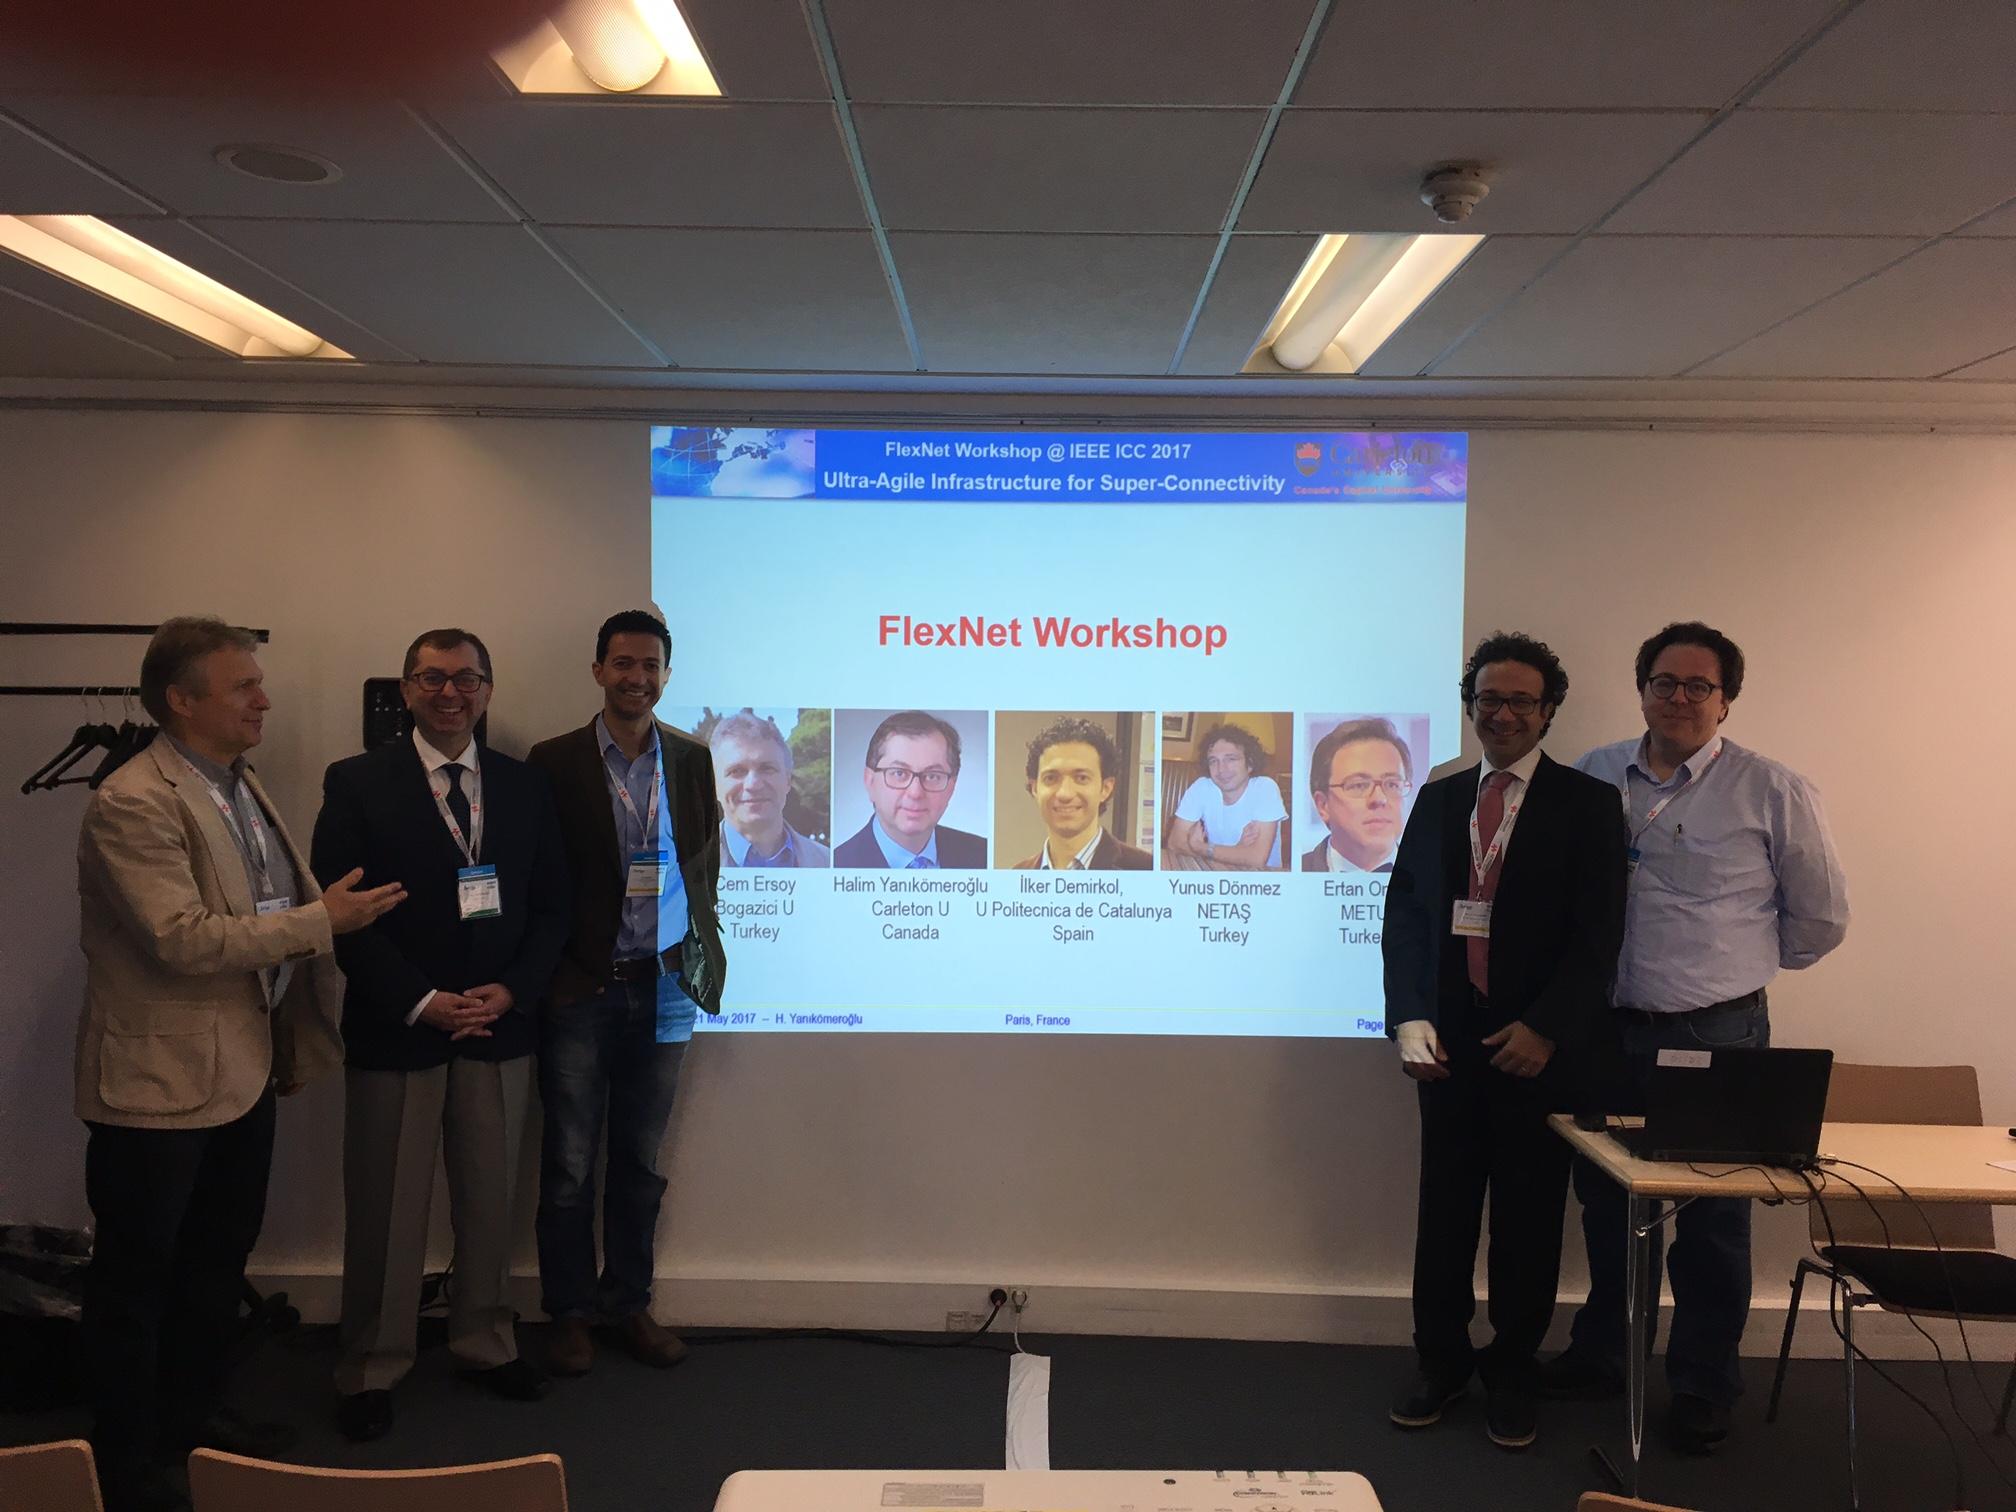 IEEE ICC Workshop on Flexible Networks (FlexNets) | Wireless Systems